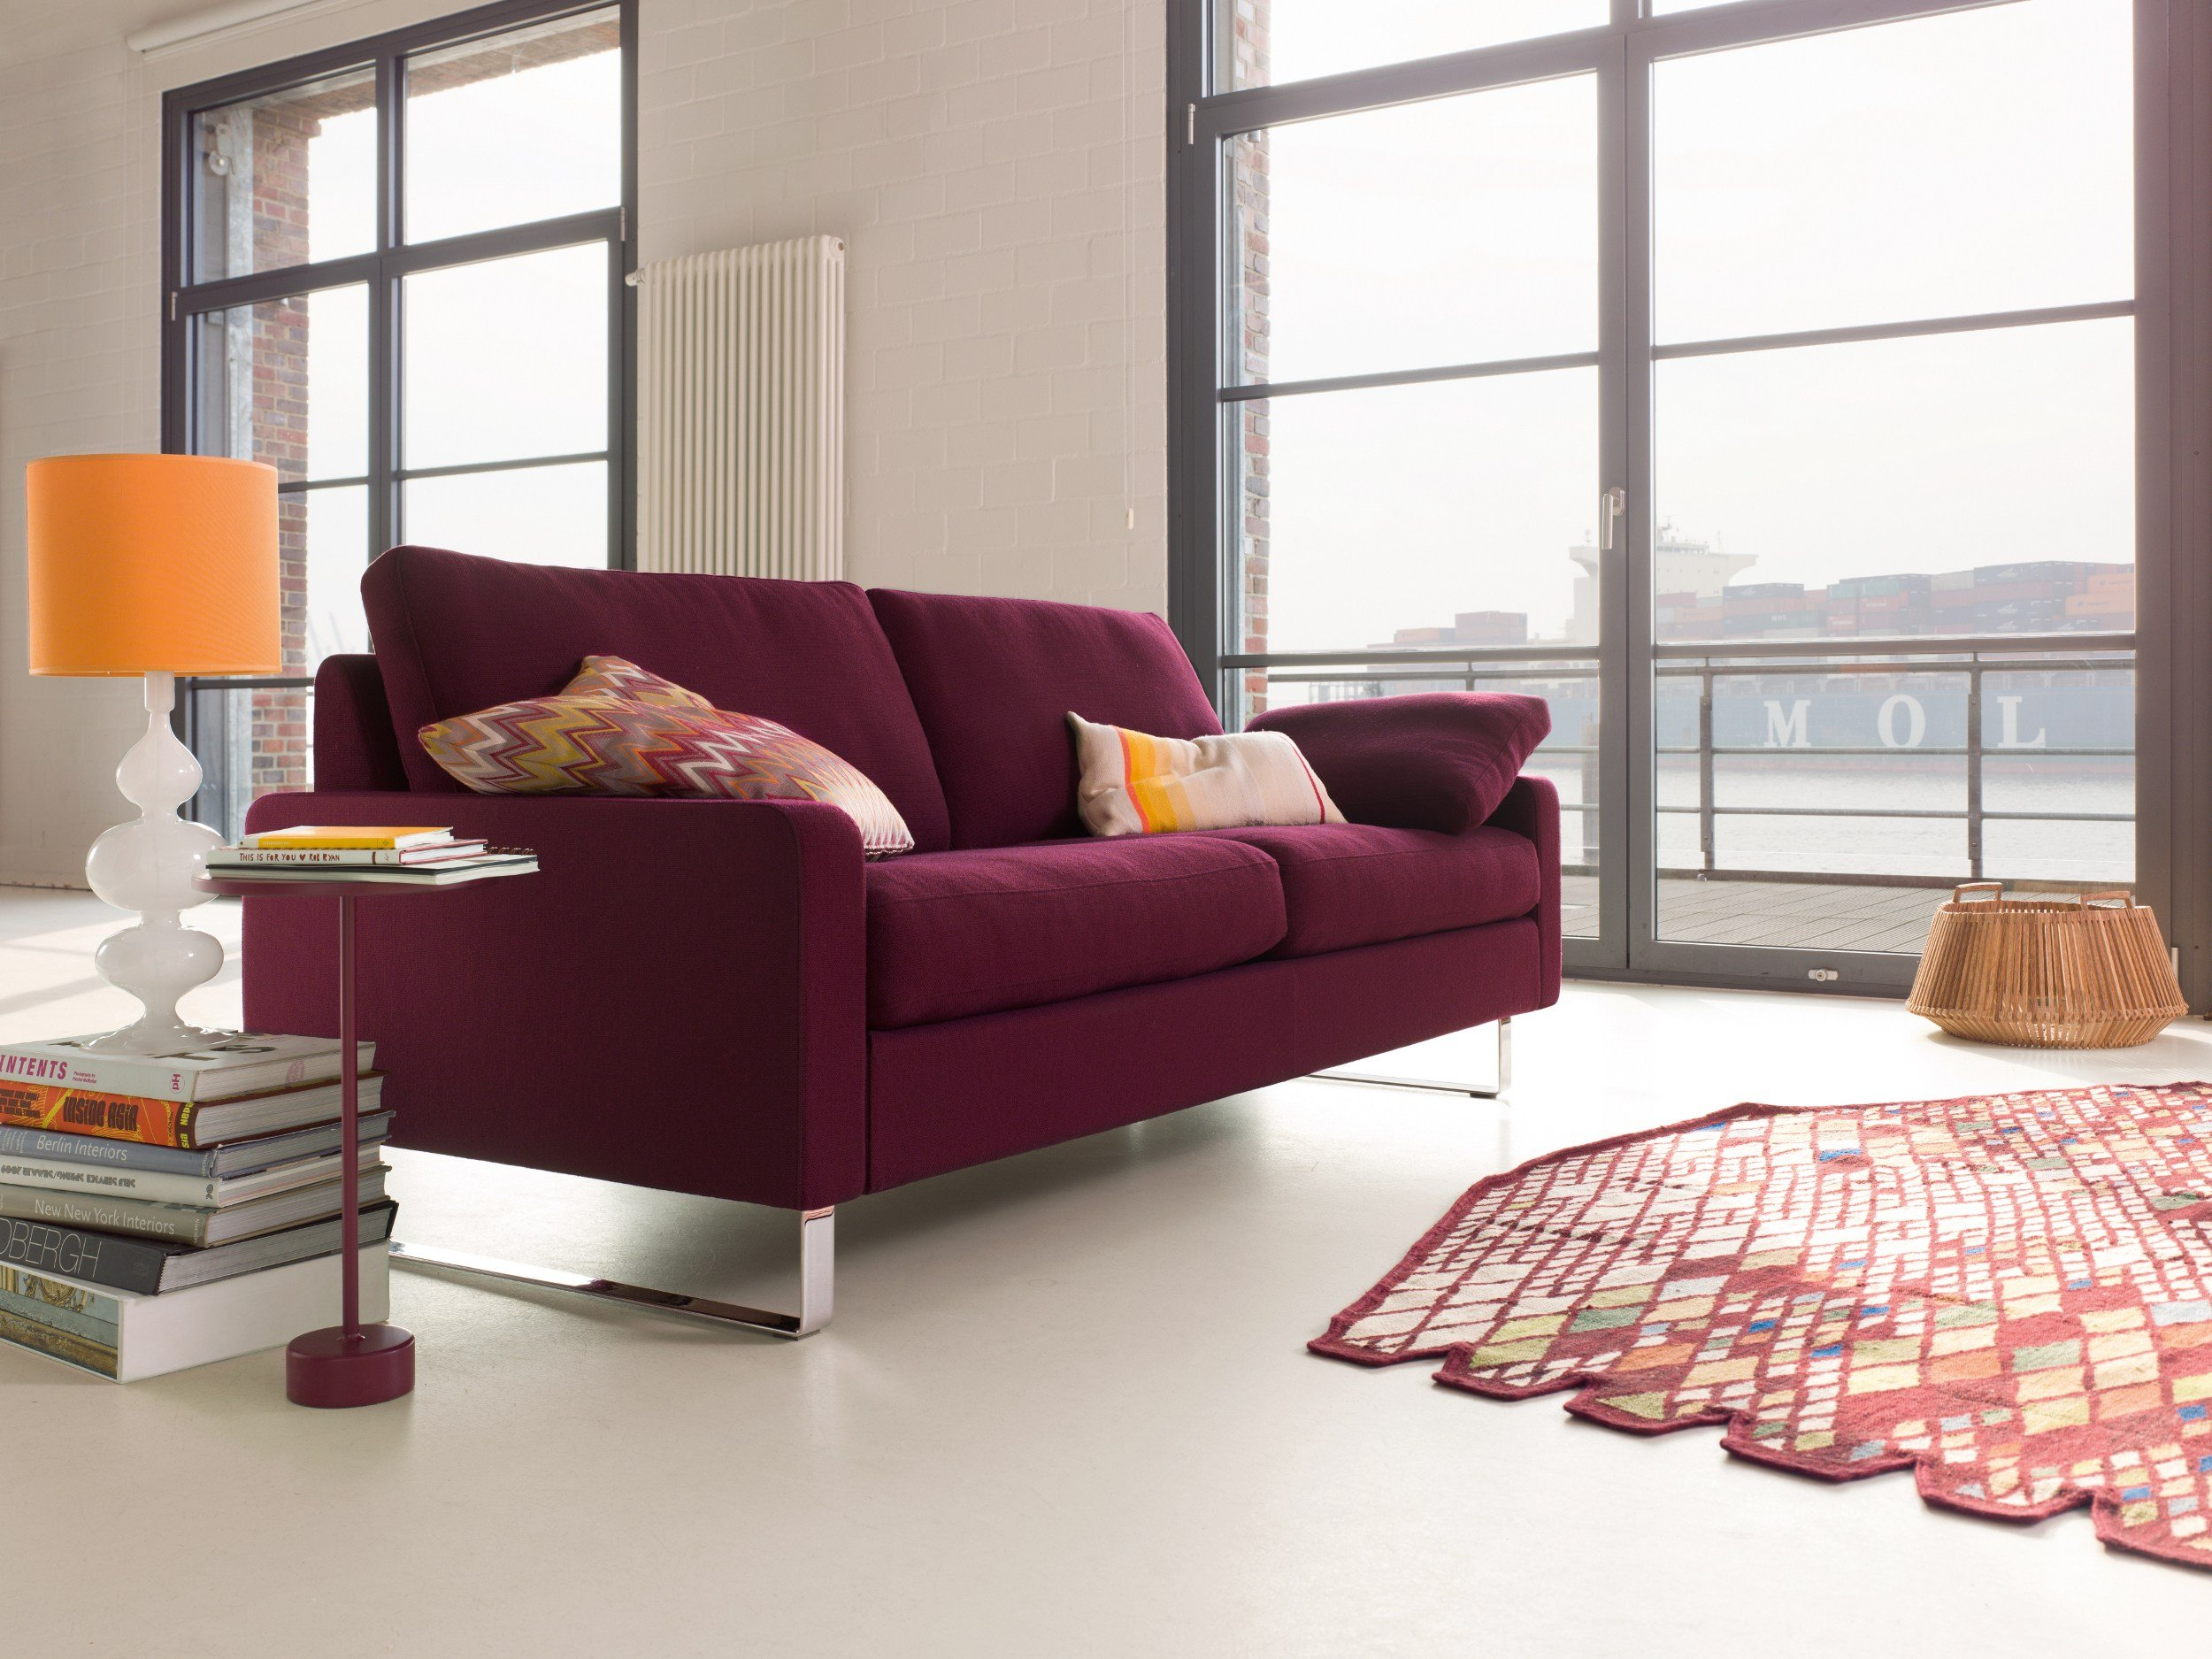 upholstered fabric sofa conseta collection by cor sitzm bel helmut l bke design friedrich. Black Bedroom Furniture Sets. Home Design Ideas